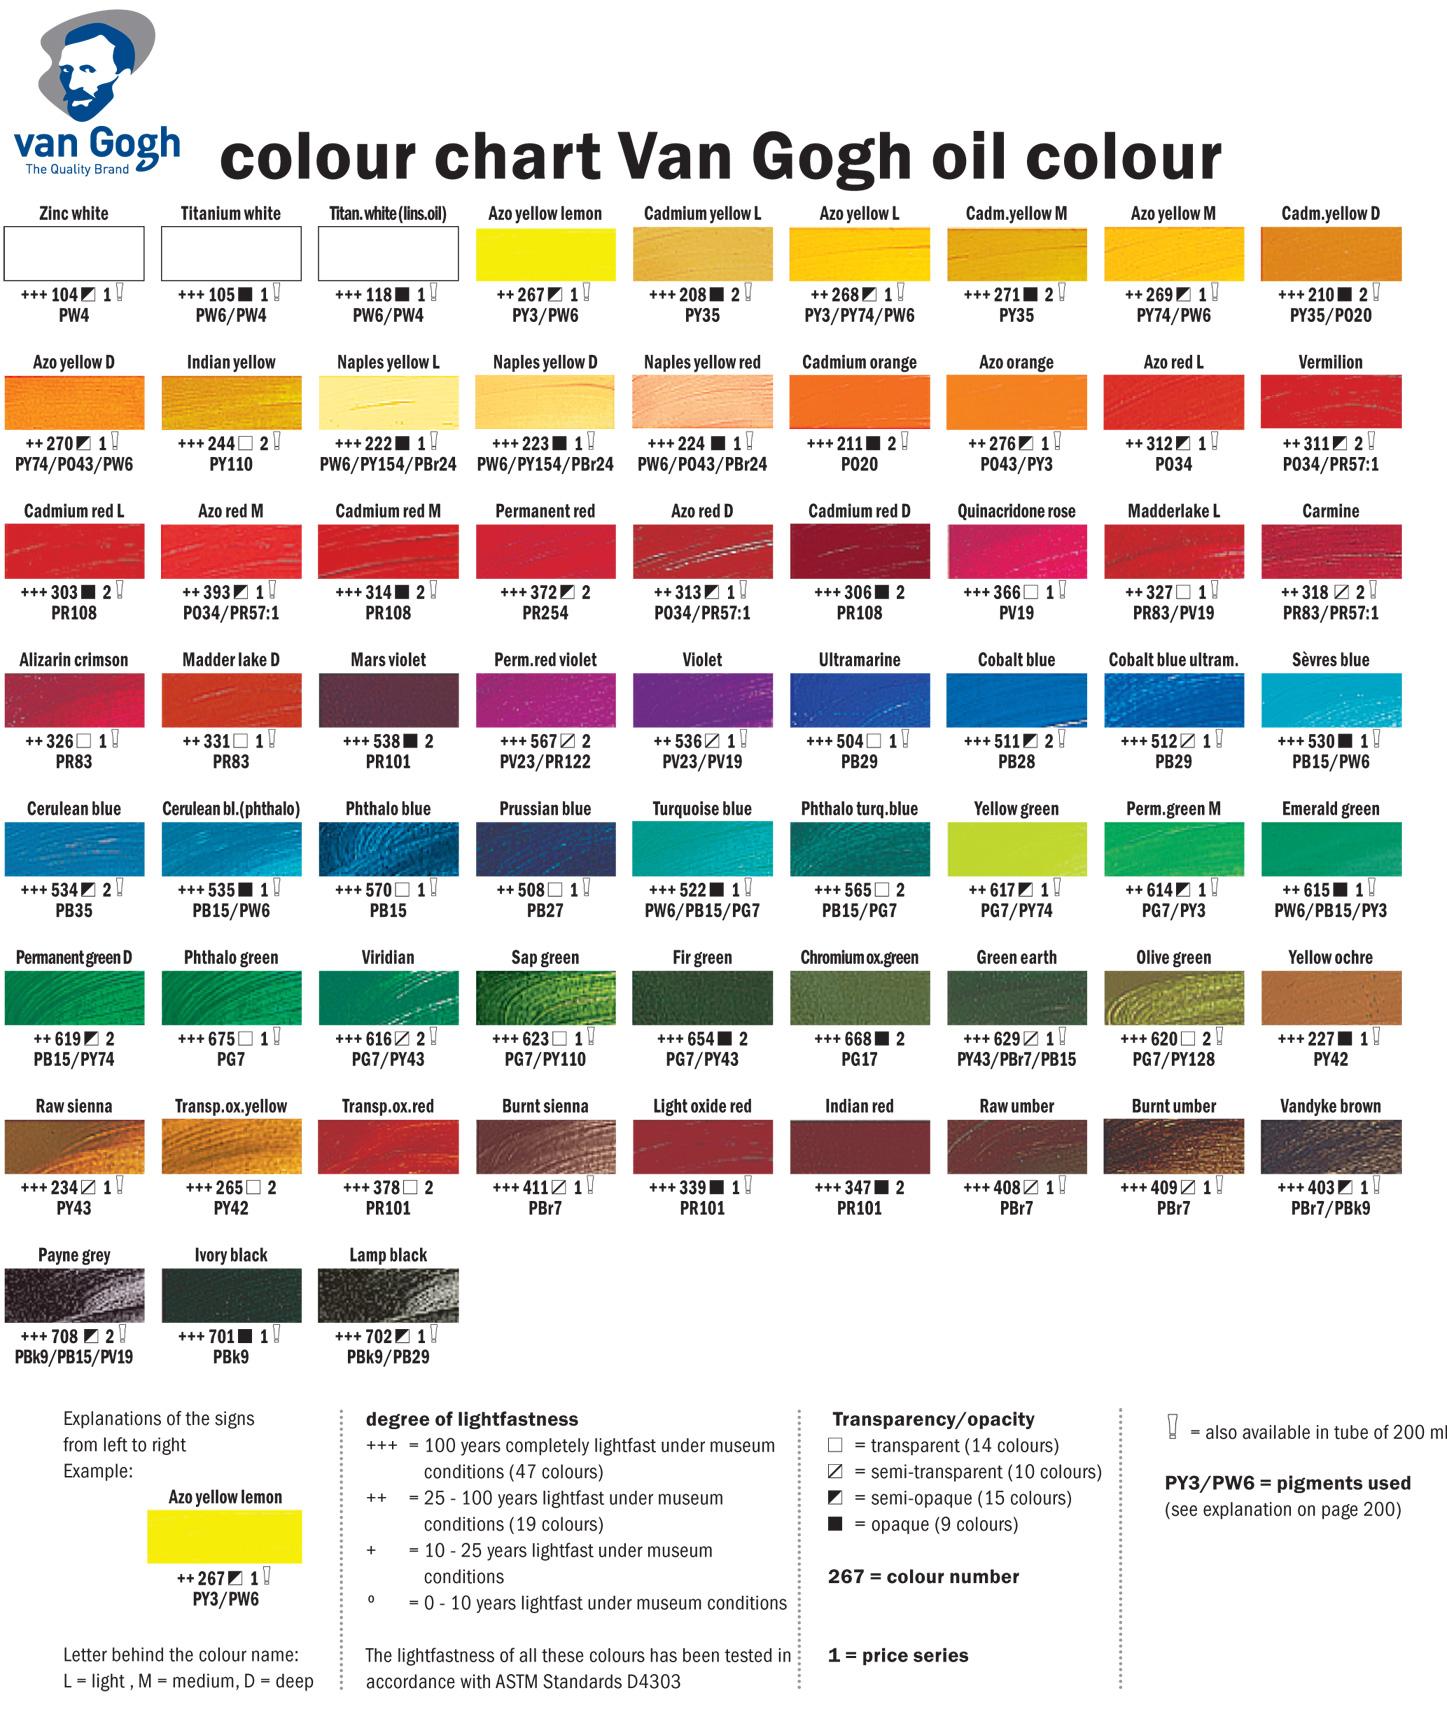 состав ткани на бирке одежды